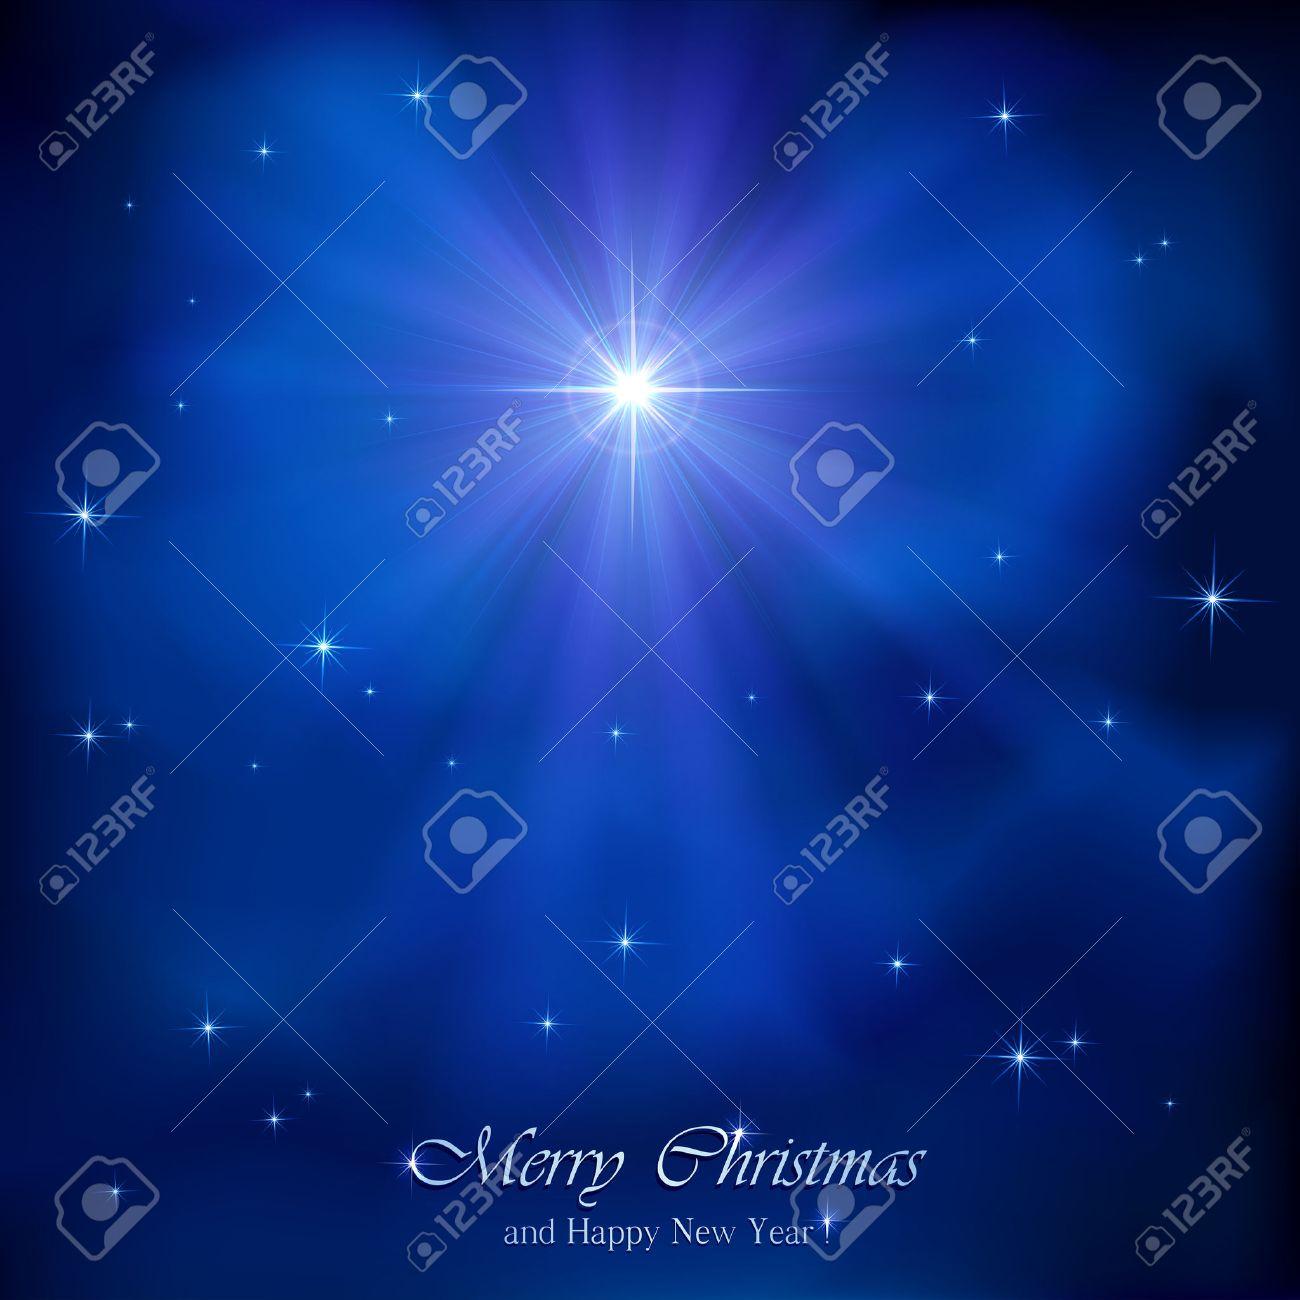 Shining Christmas star in the blue night sky, illustration. - 32794015